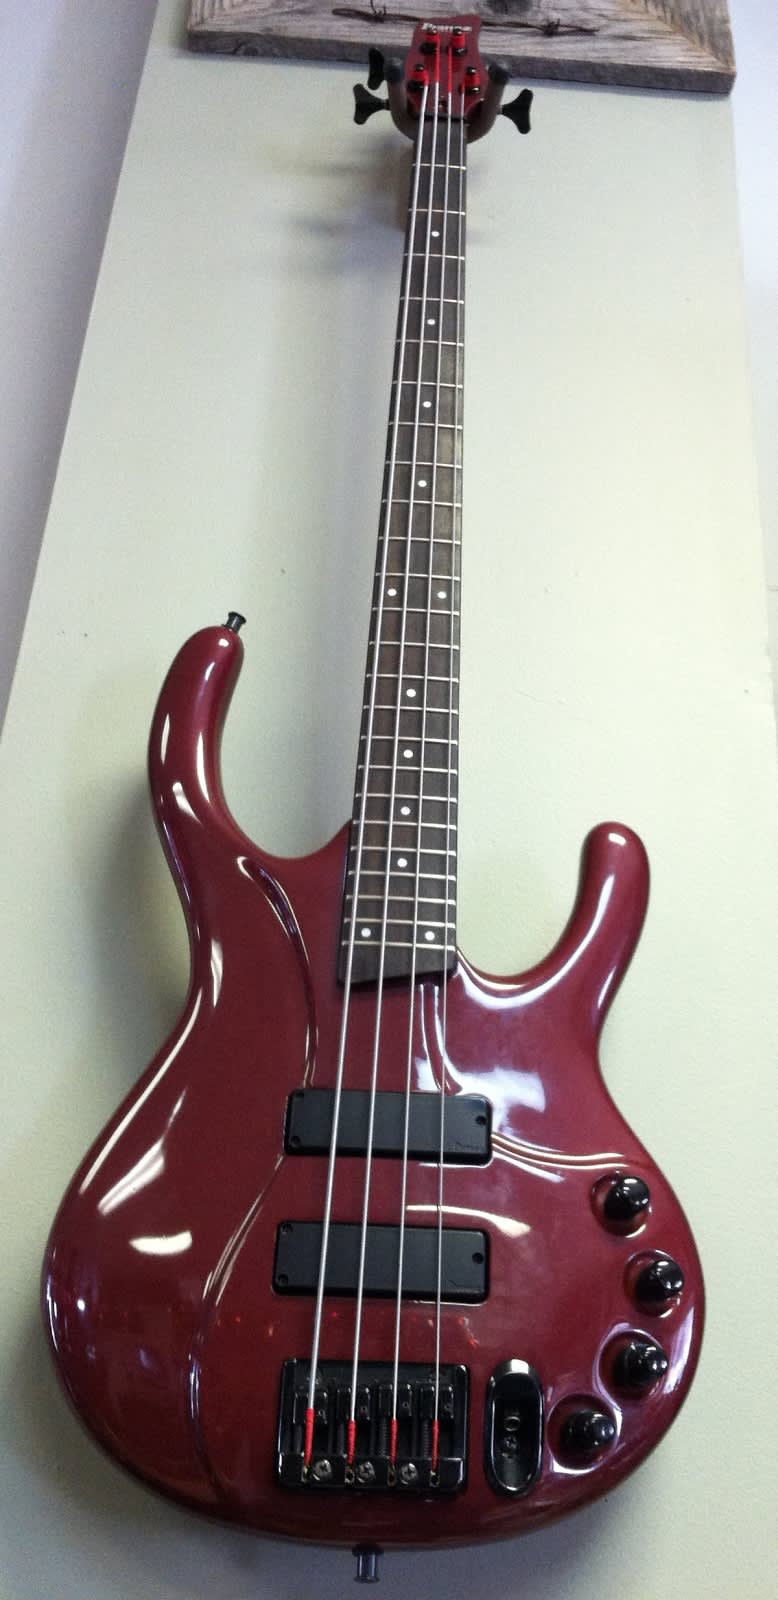 ibanez edc 700 4 string active electric bass guitar reverb. Black Bedroom Furniture Sets. Home Design Ideas